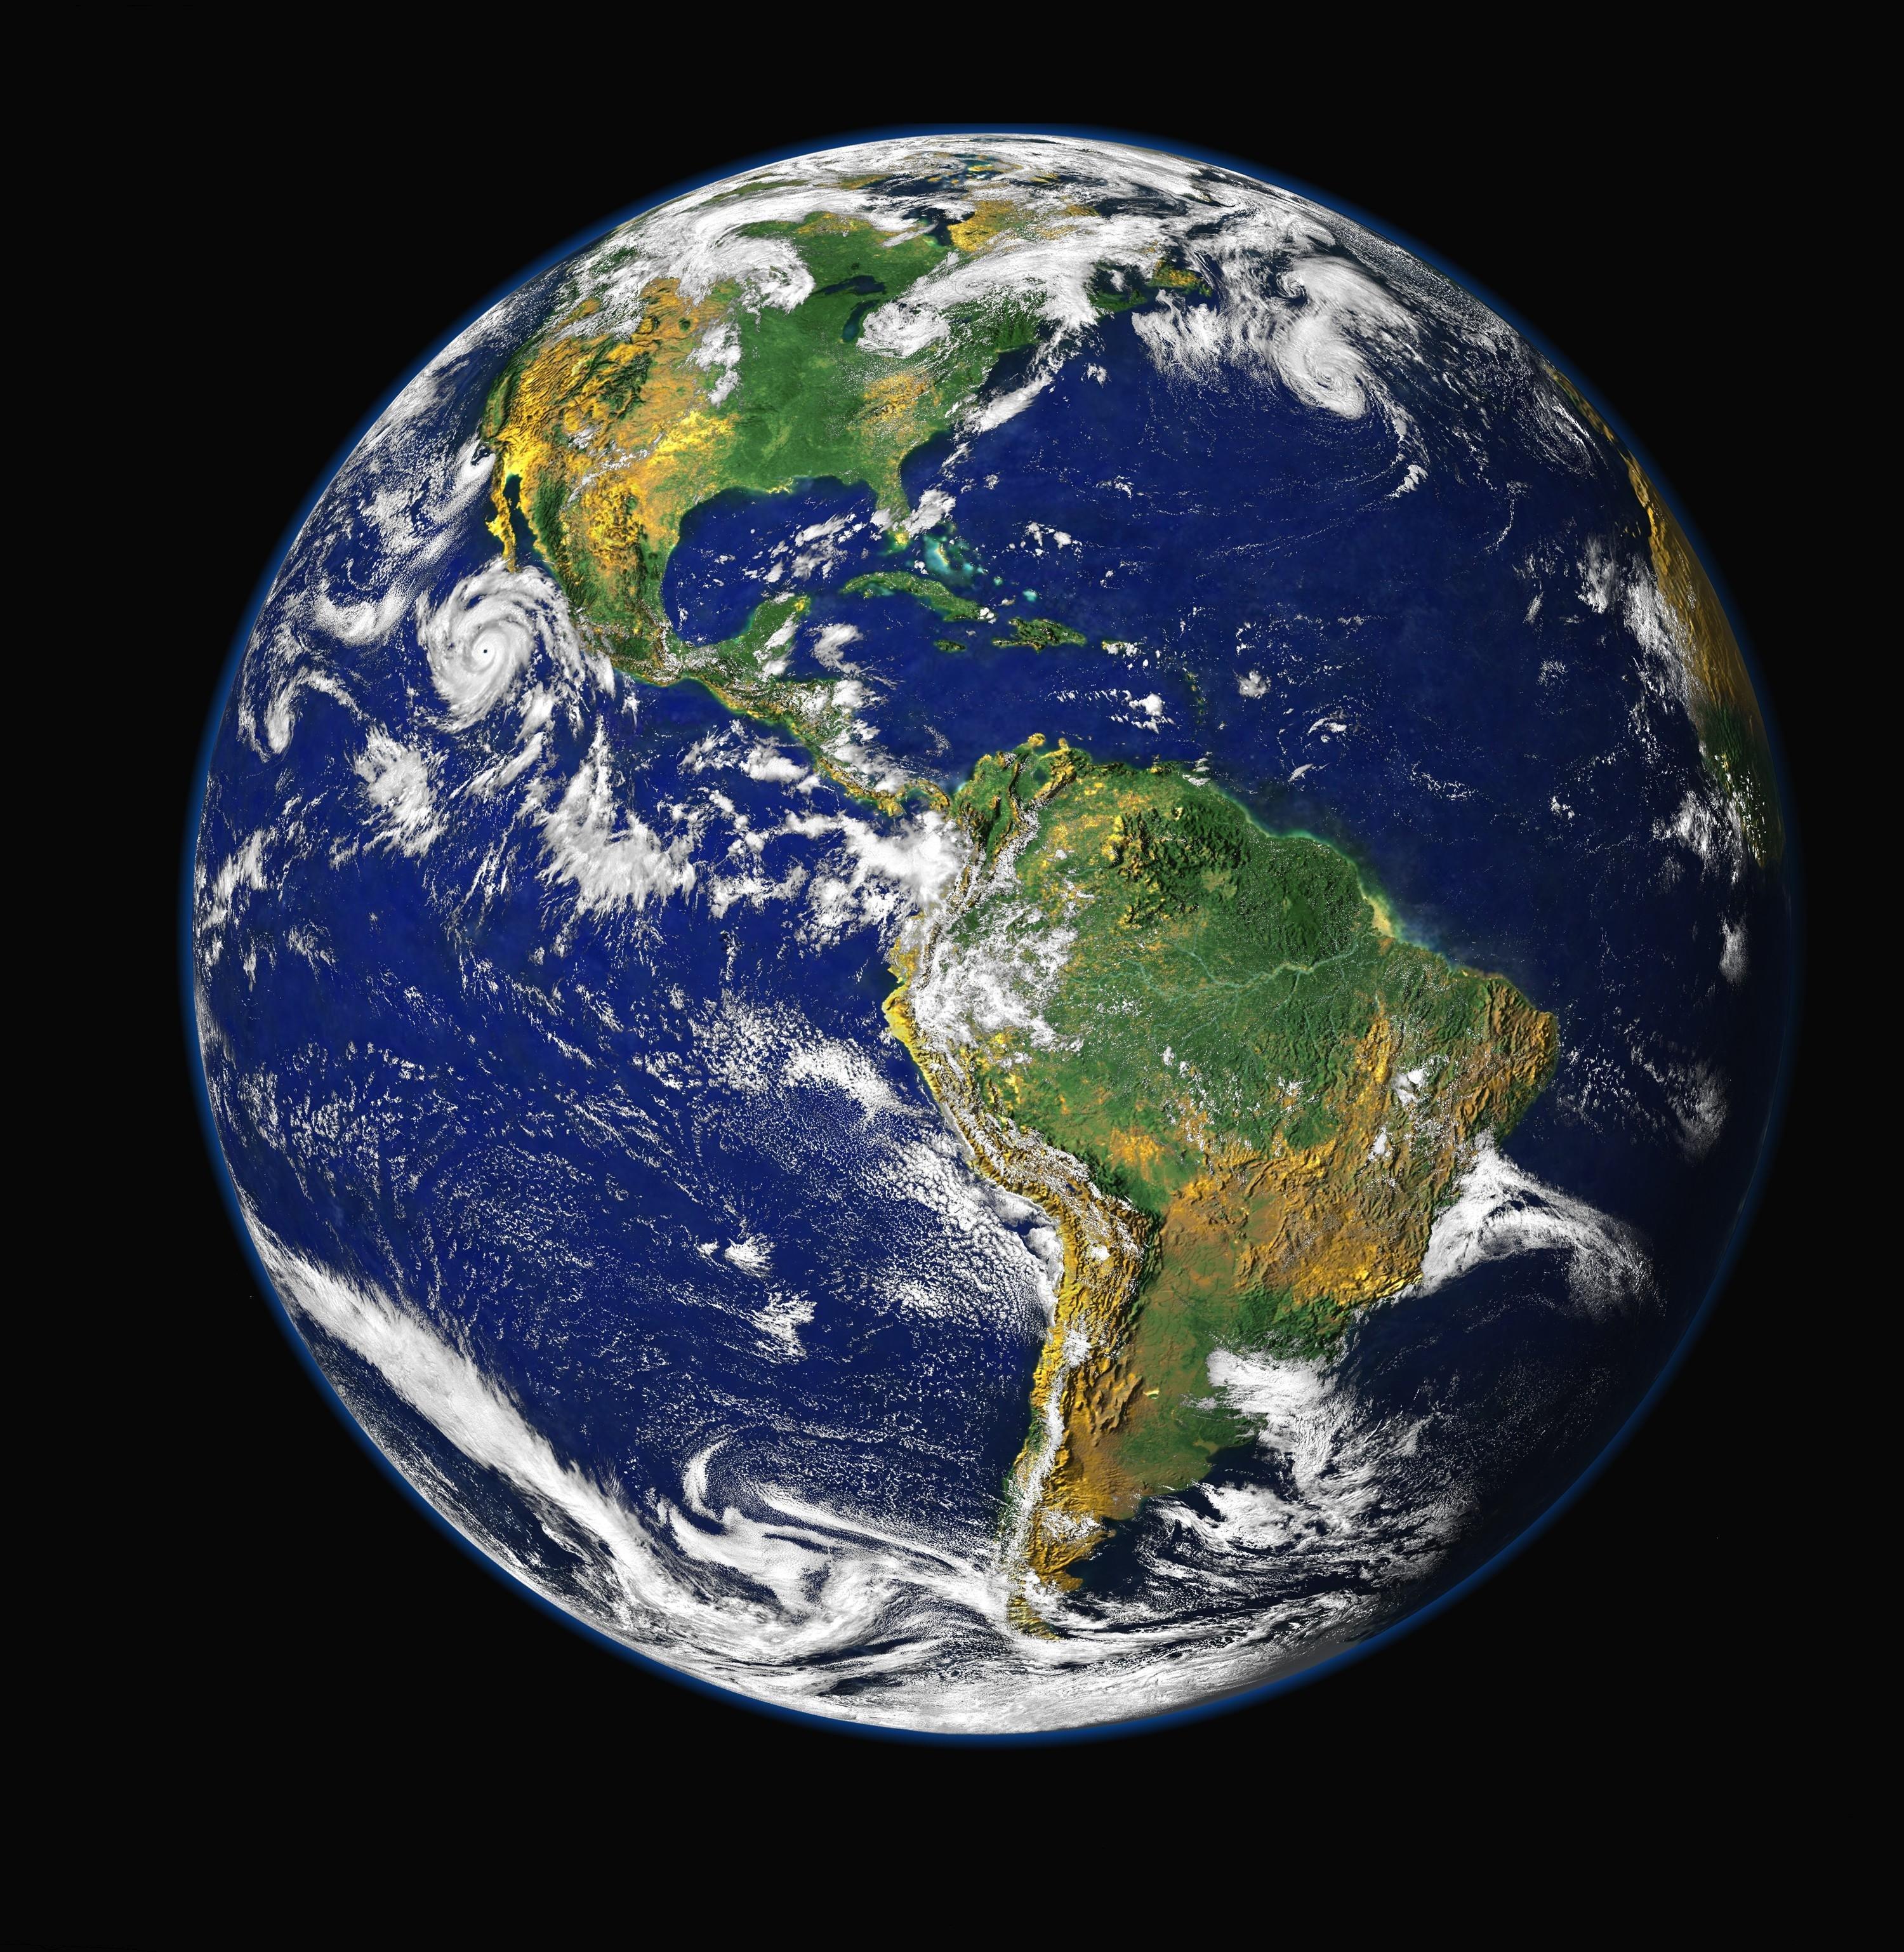 Free Images : atmosphere, aviation, night sky, globe, world